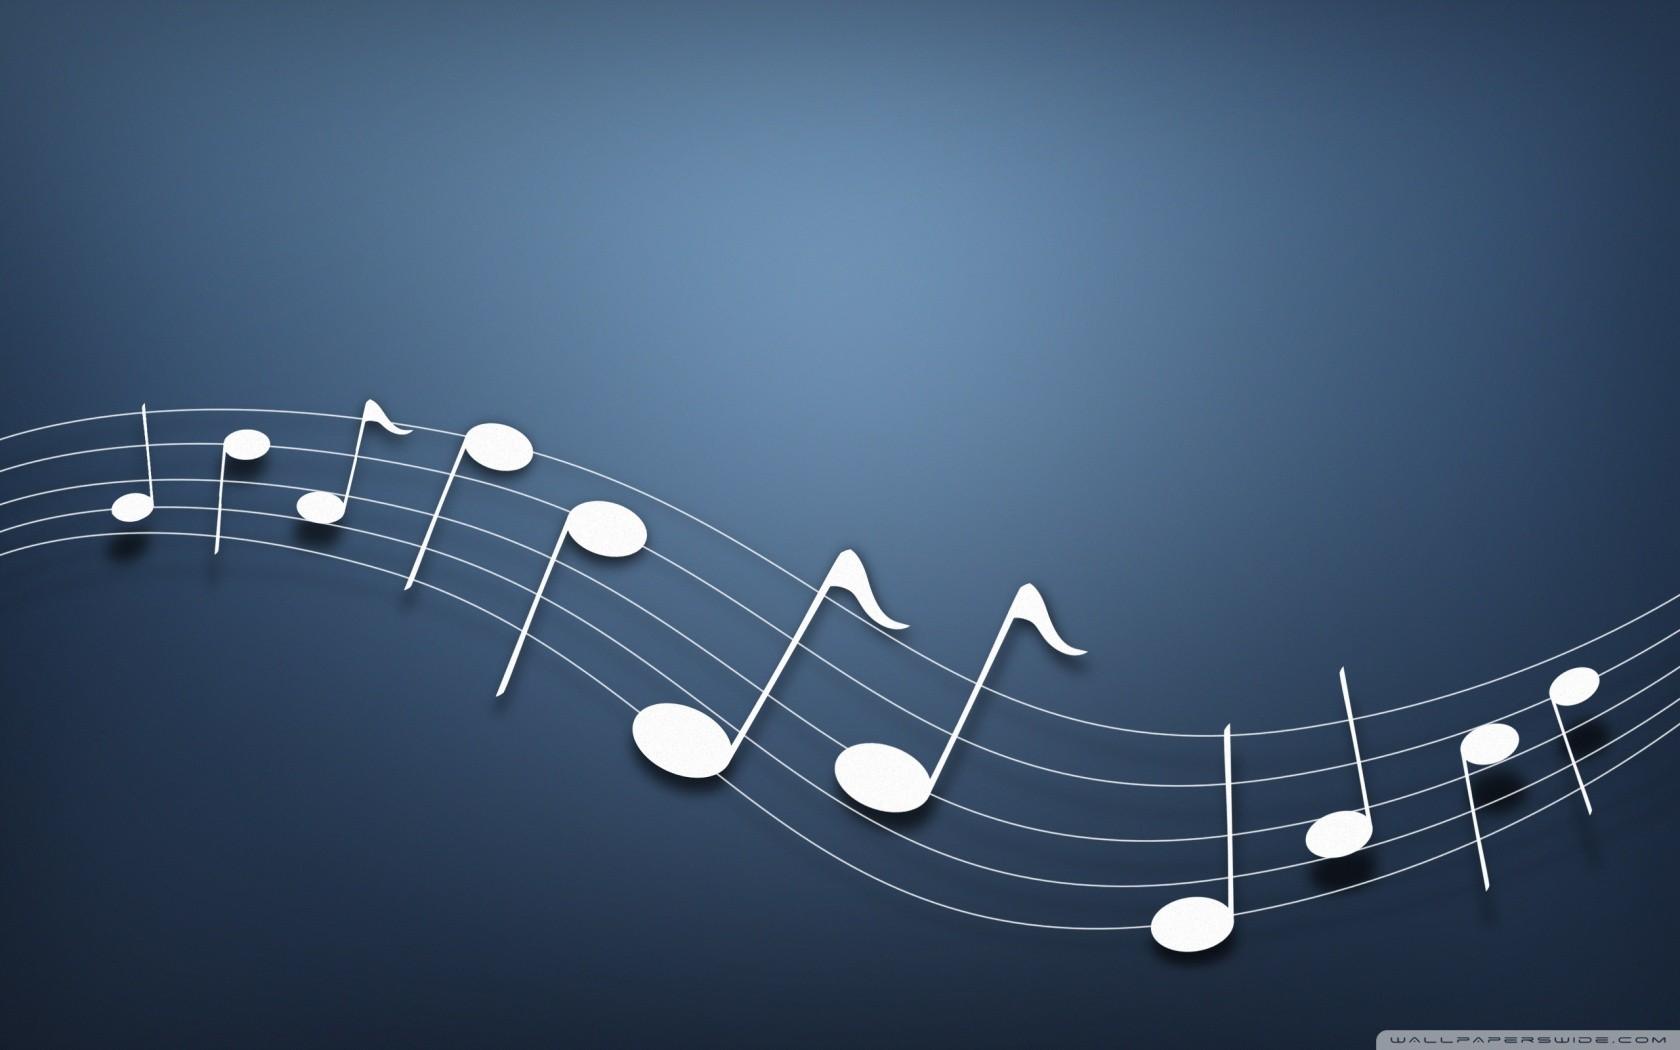 Download Music Notes Wallpaper 1680x1050 Wallpoper 279525 1680x1050